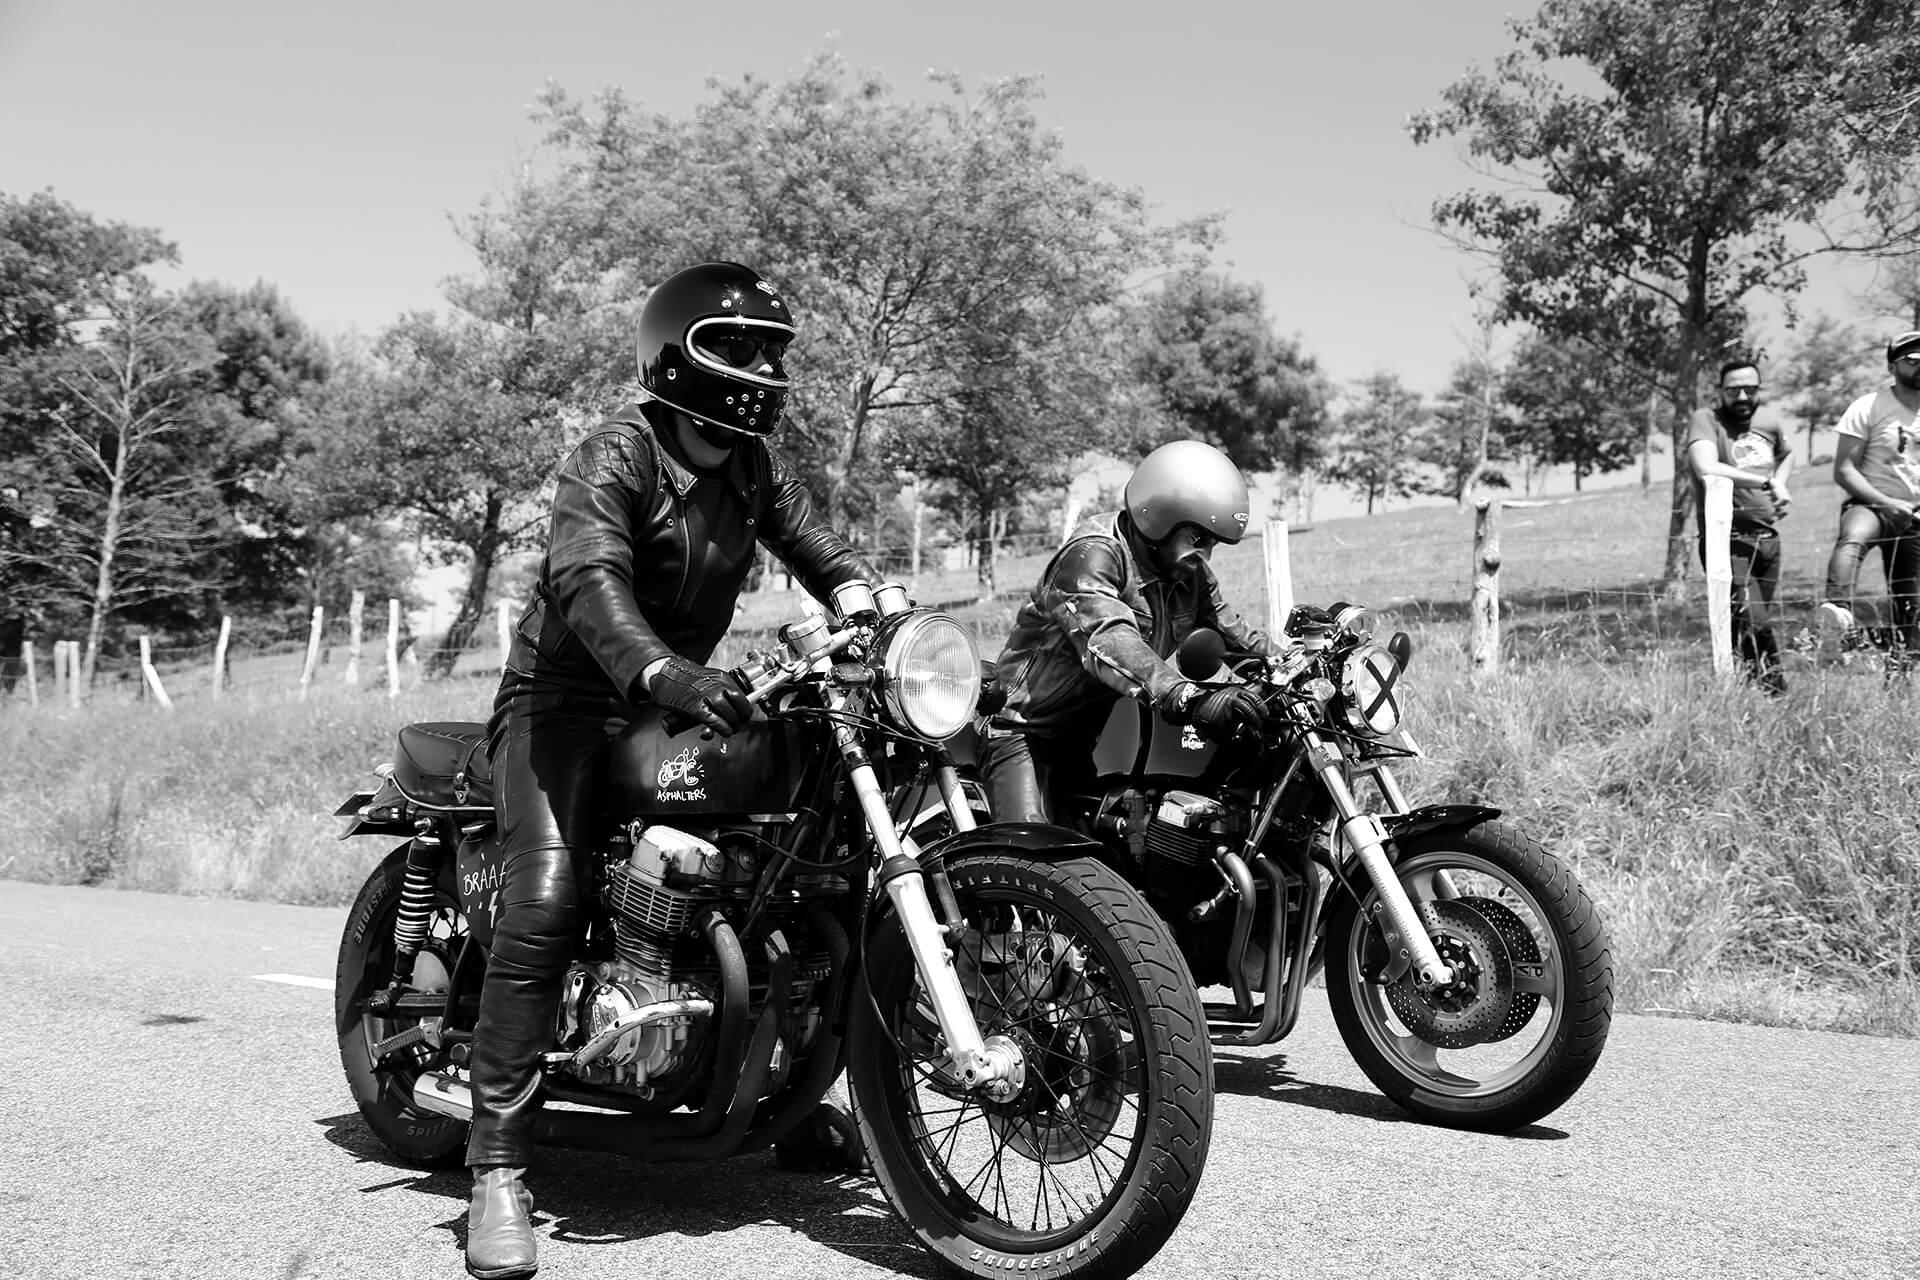 Wheels, Waves, Wheels and Waves, fashion, helmet, sparkle, biker, motorcycle, bike, france, film, photography, event, WeAreShuffle, start line